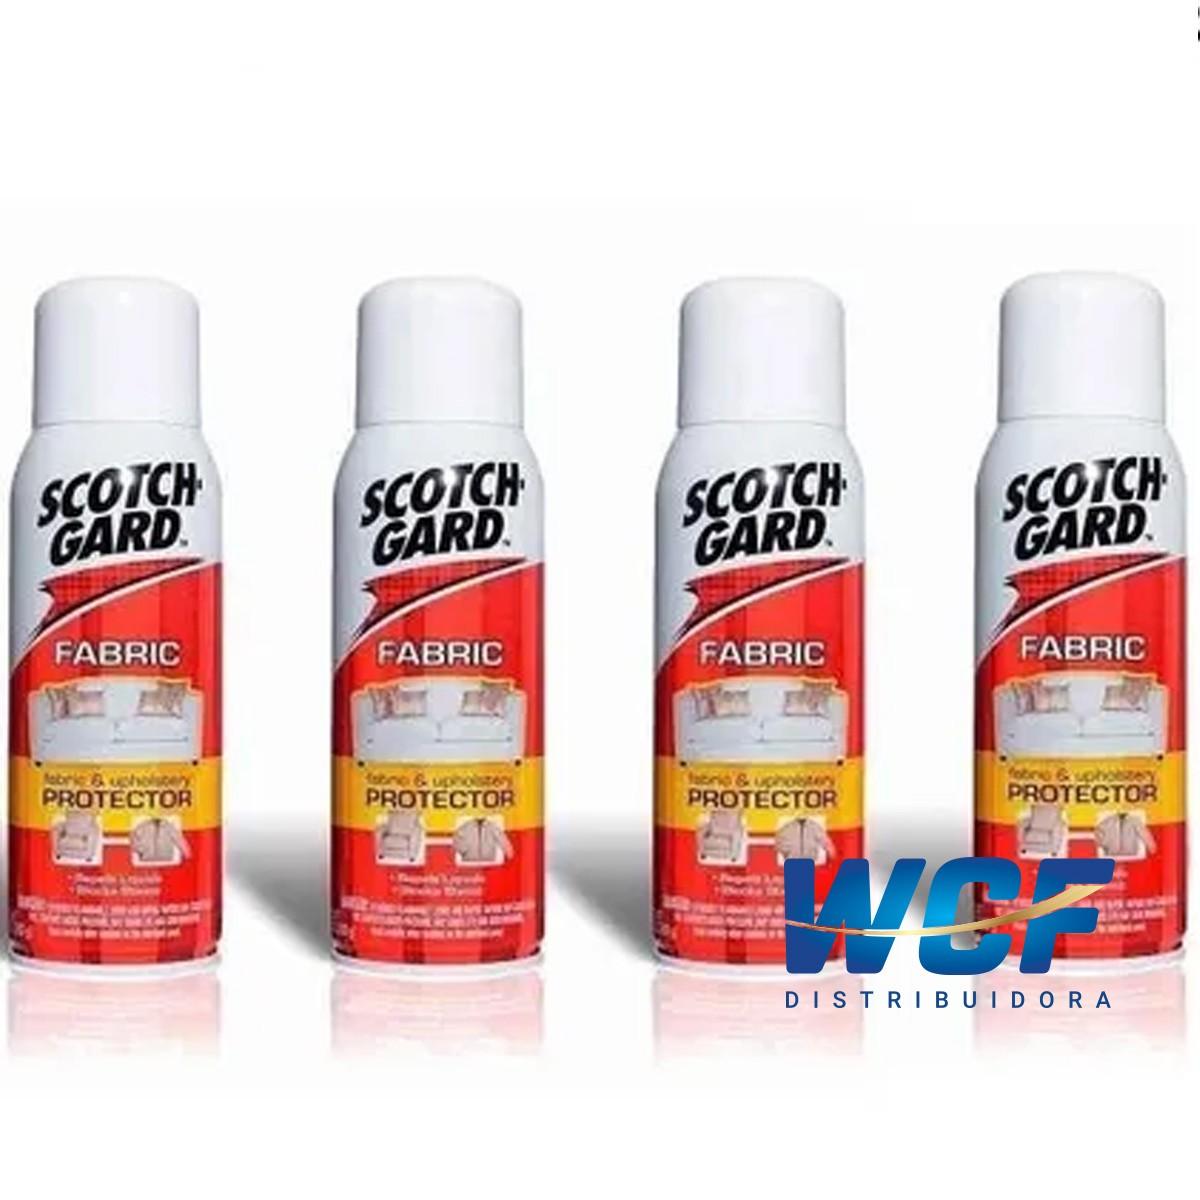 Kit Com 4 Scotchgard 3m Protector Spray Impermeabilizante